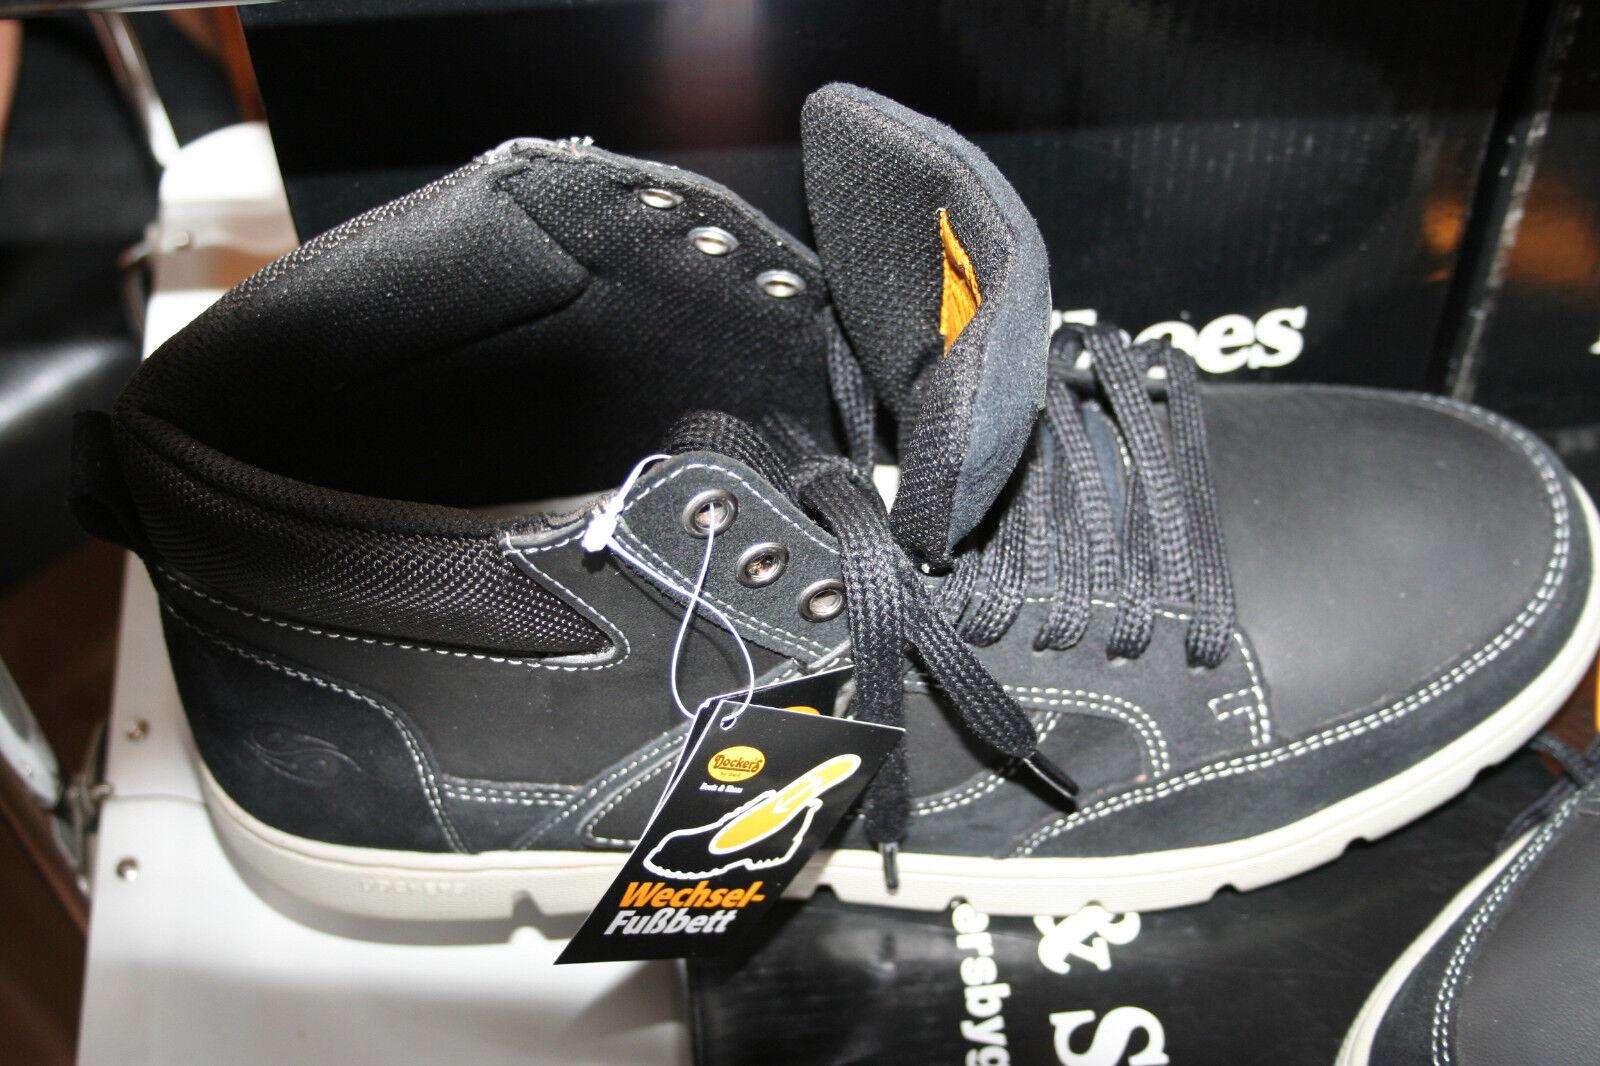 DOCKERS    Stiefel Neu  schwarz  echt  Leder   kombiniert Gr 43